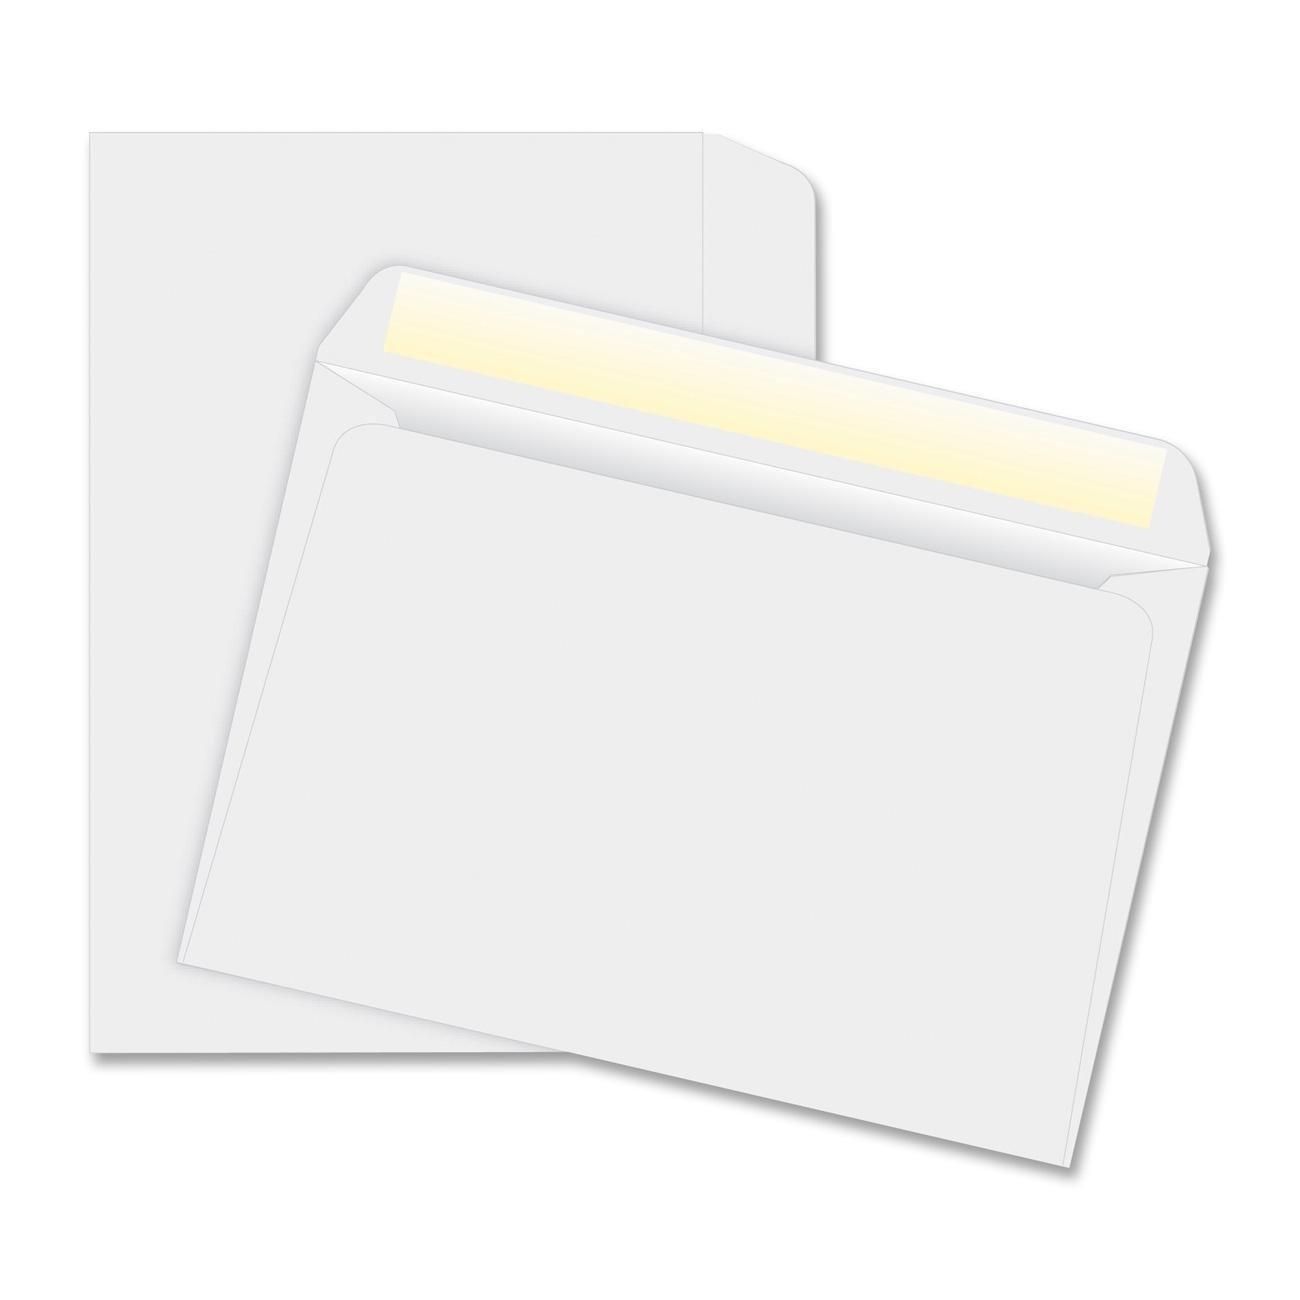 Quality Park Large Format/Catalog Envelopes, 6 X 9-Inch, White, Box of 500 (QUA37181)